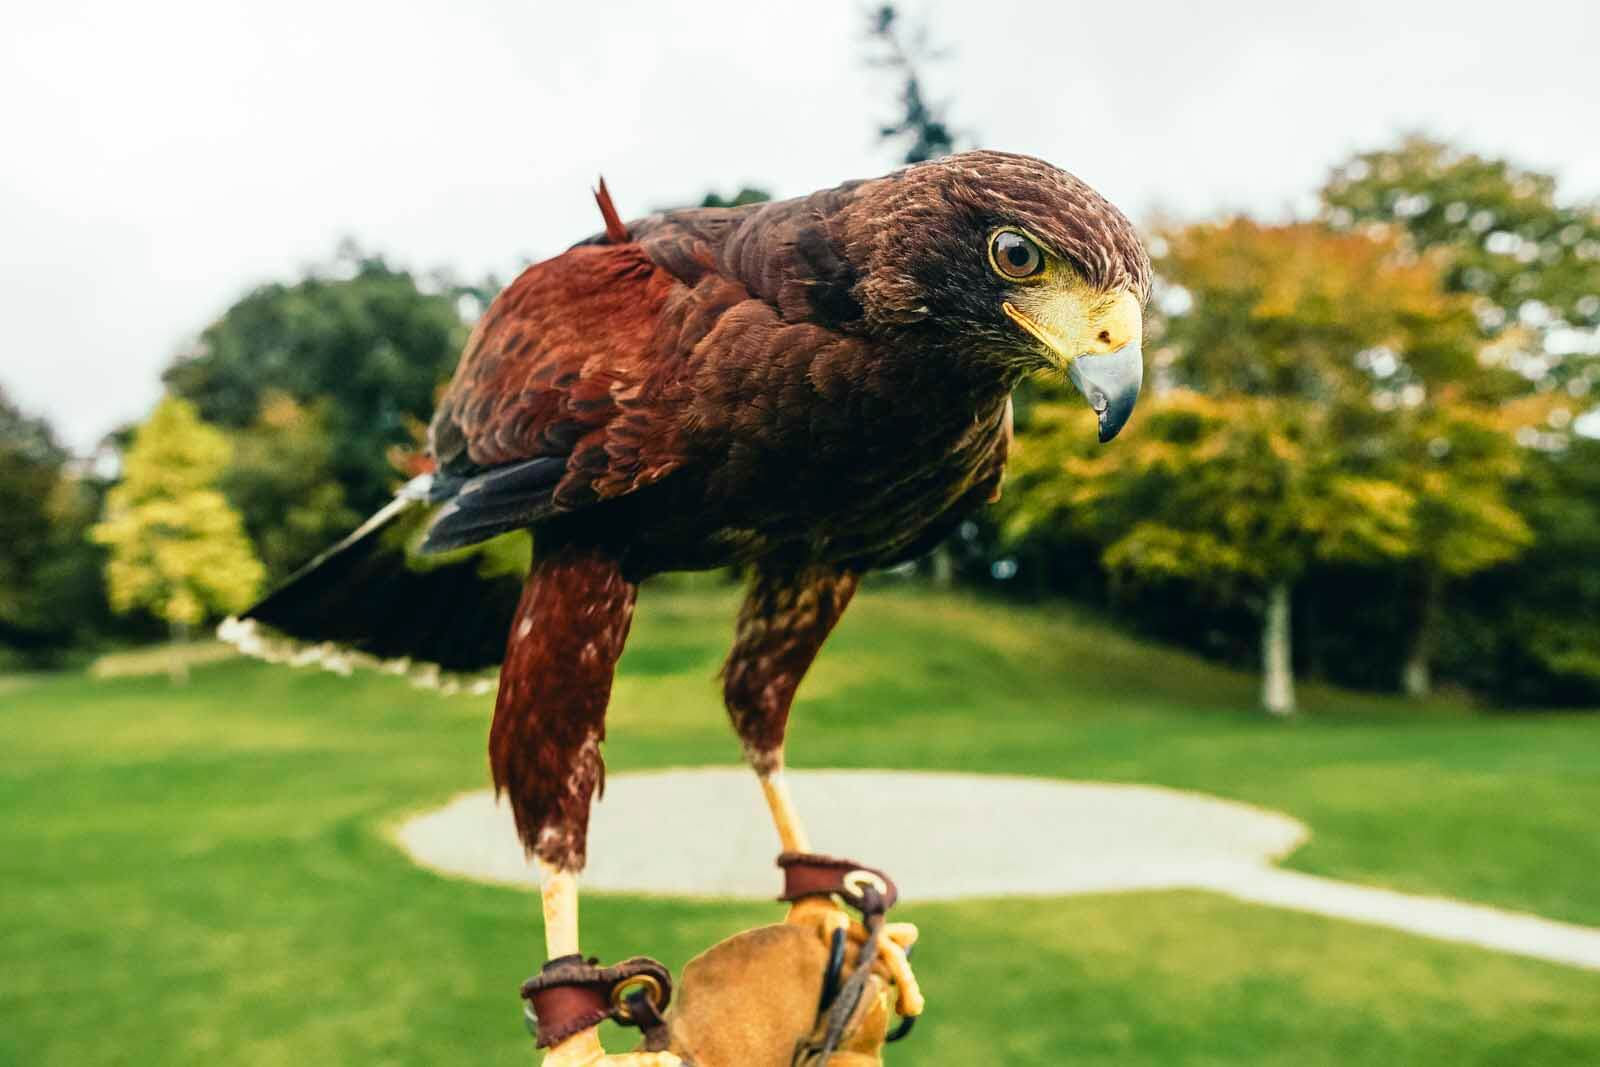 Hawk at Dromoland Castle in IReland